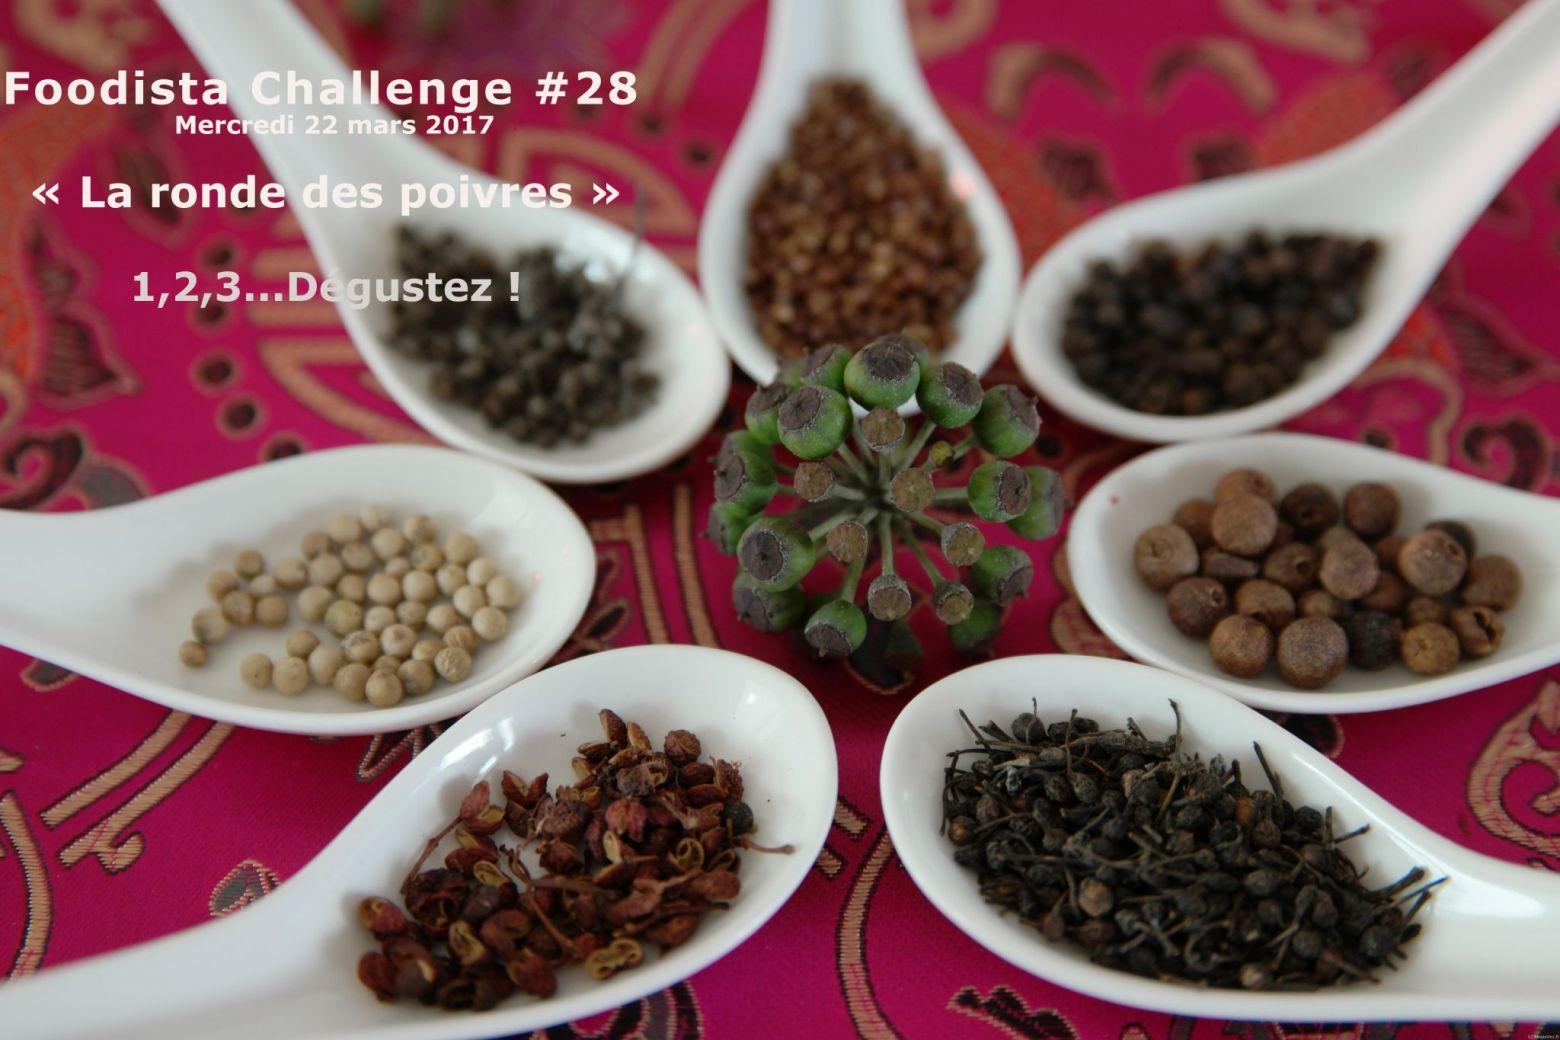 Foodista challenge #28